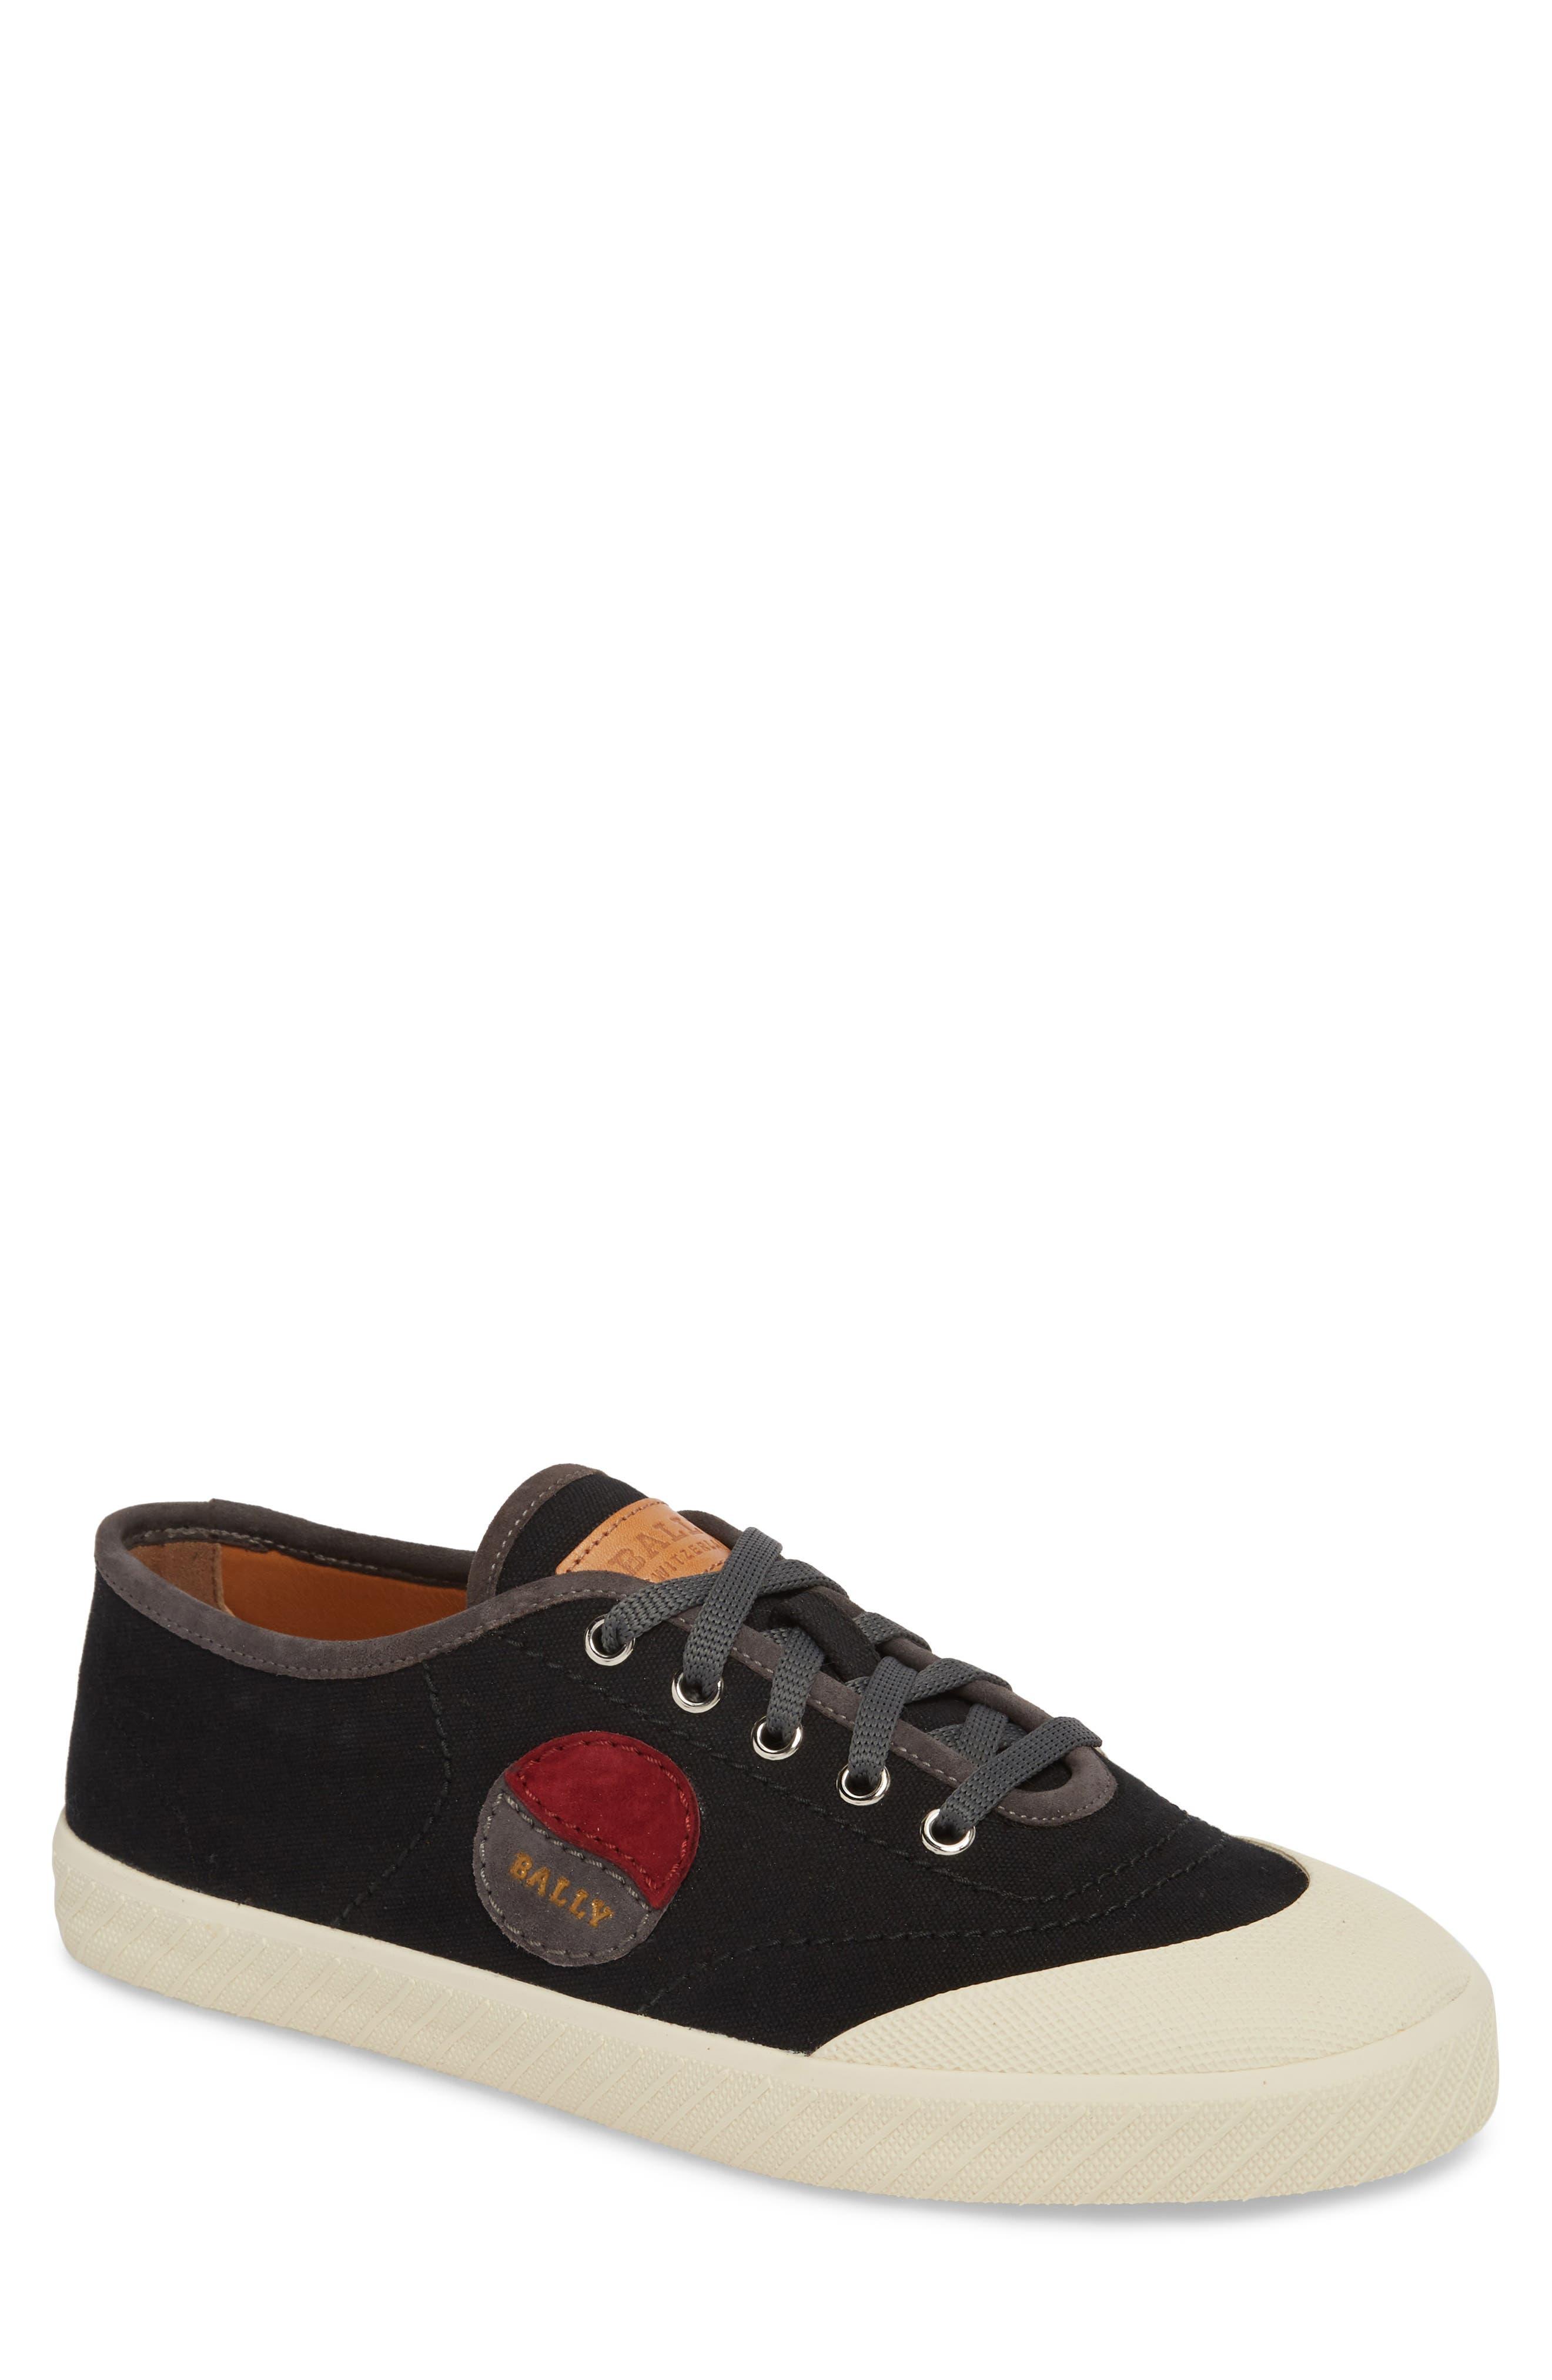 Silio Low Top Sneaker,                         Main,                         color, 001